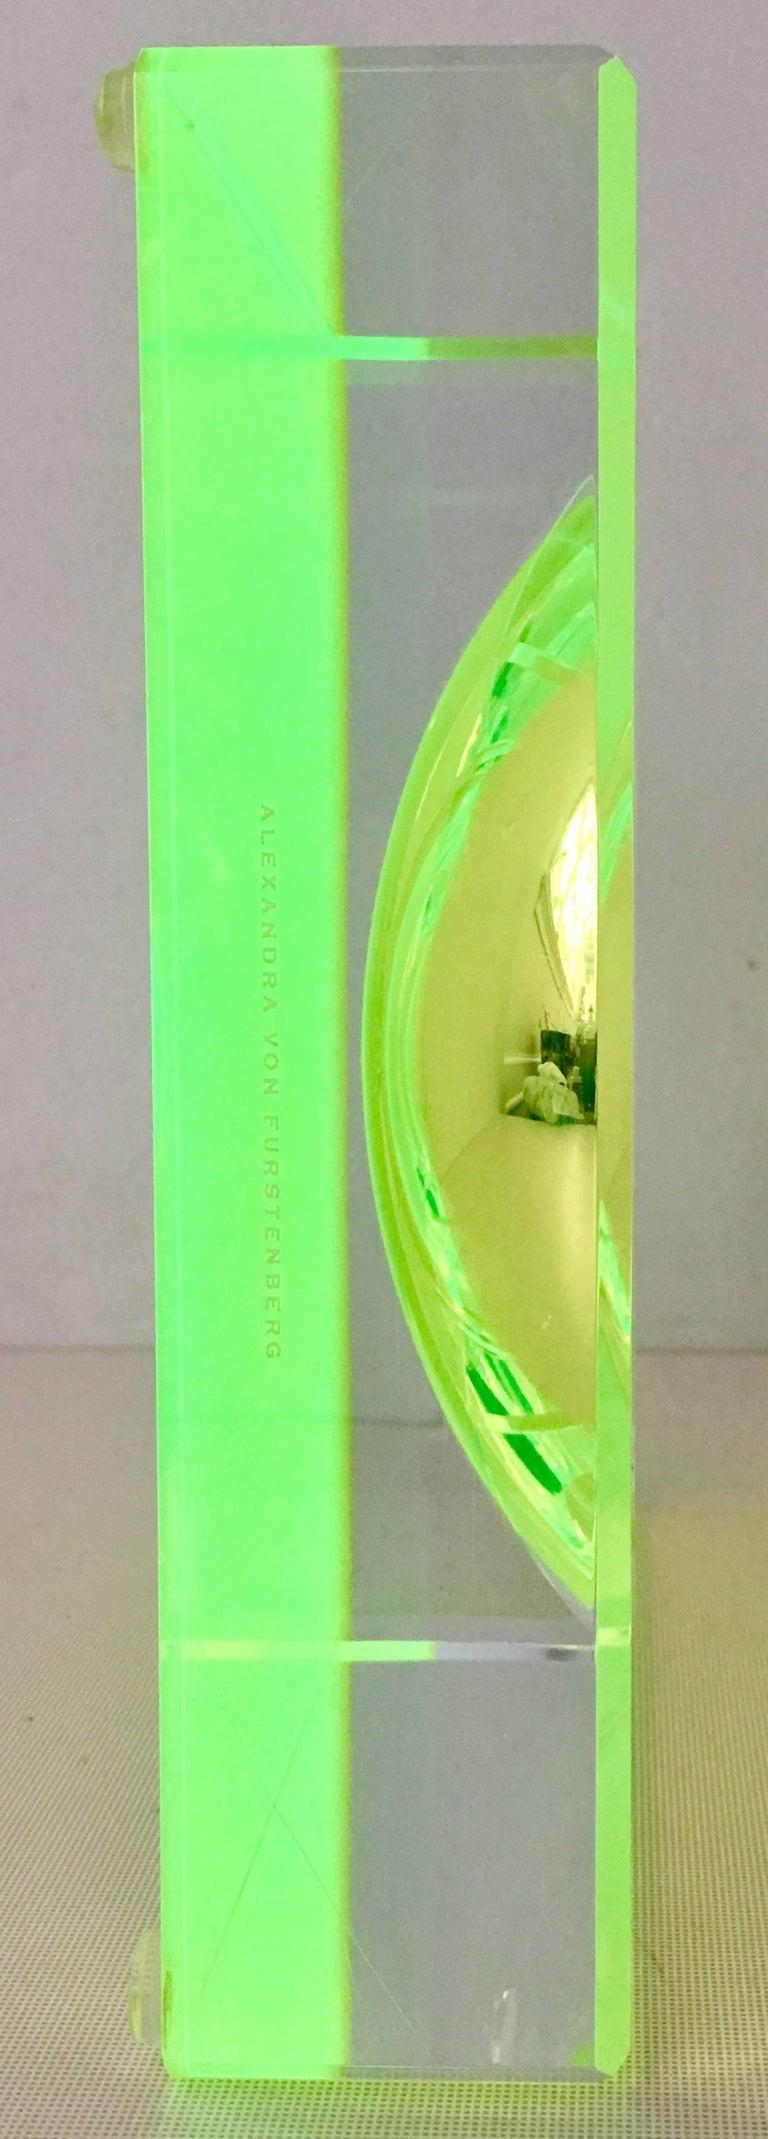 Modern Lucite Optic Square & Round Green Bowl By, Alexendra Von Furstenberg For Sale 1